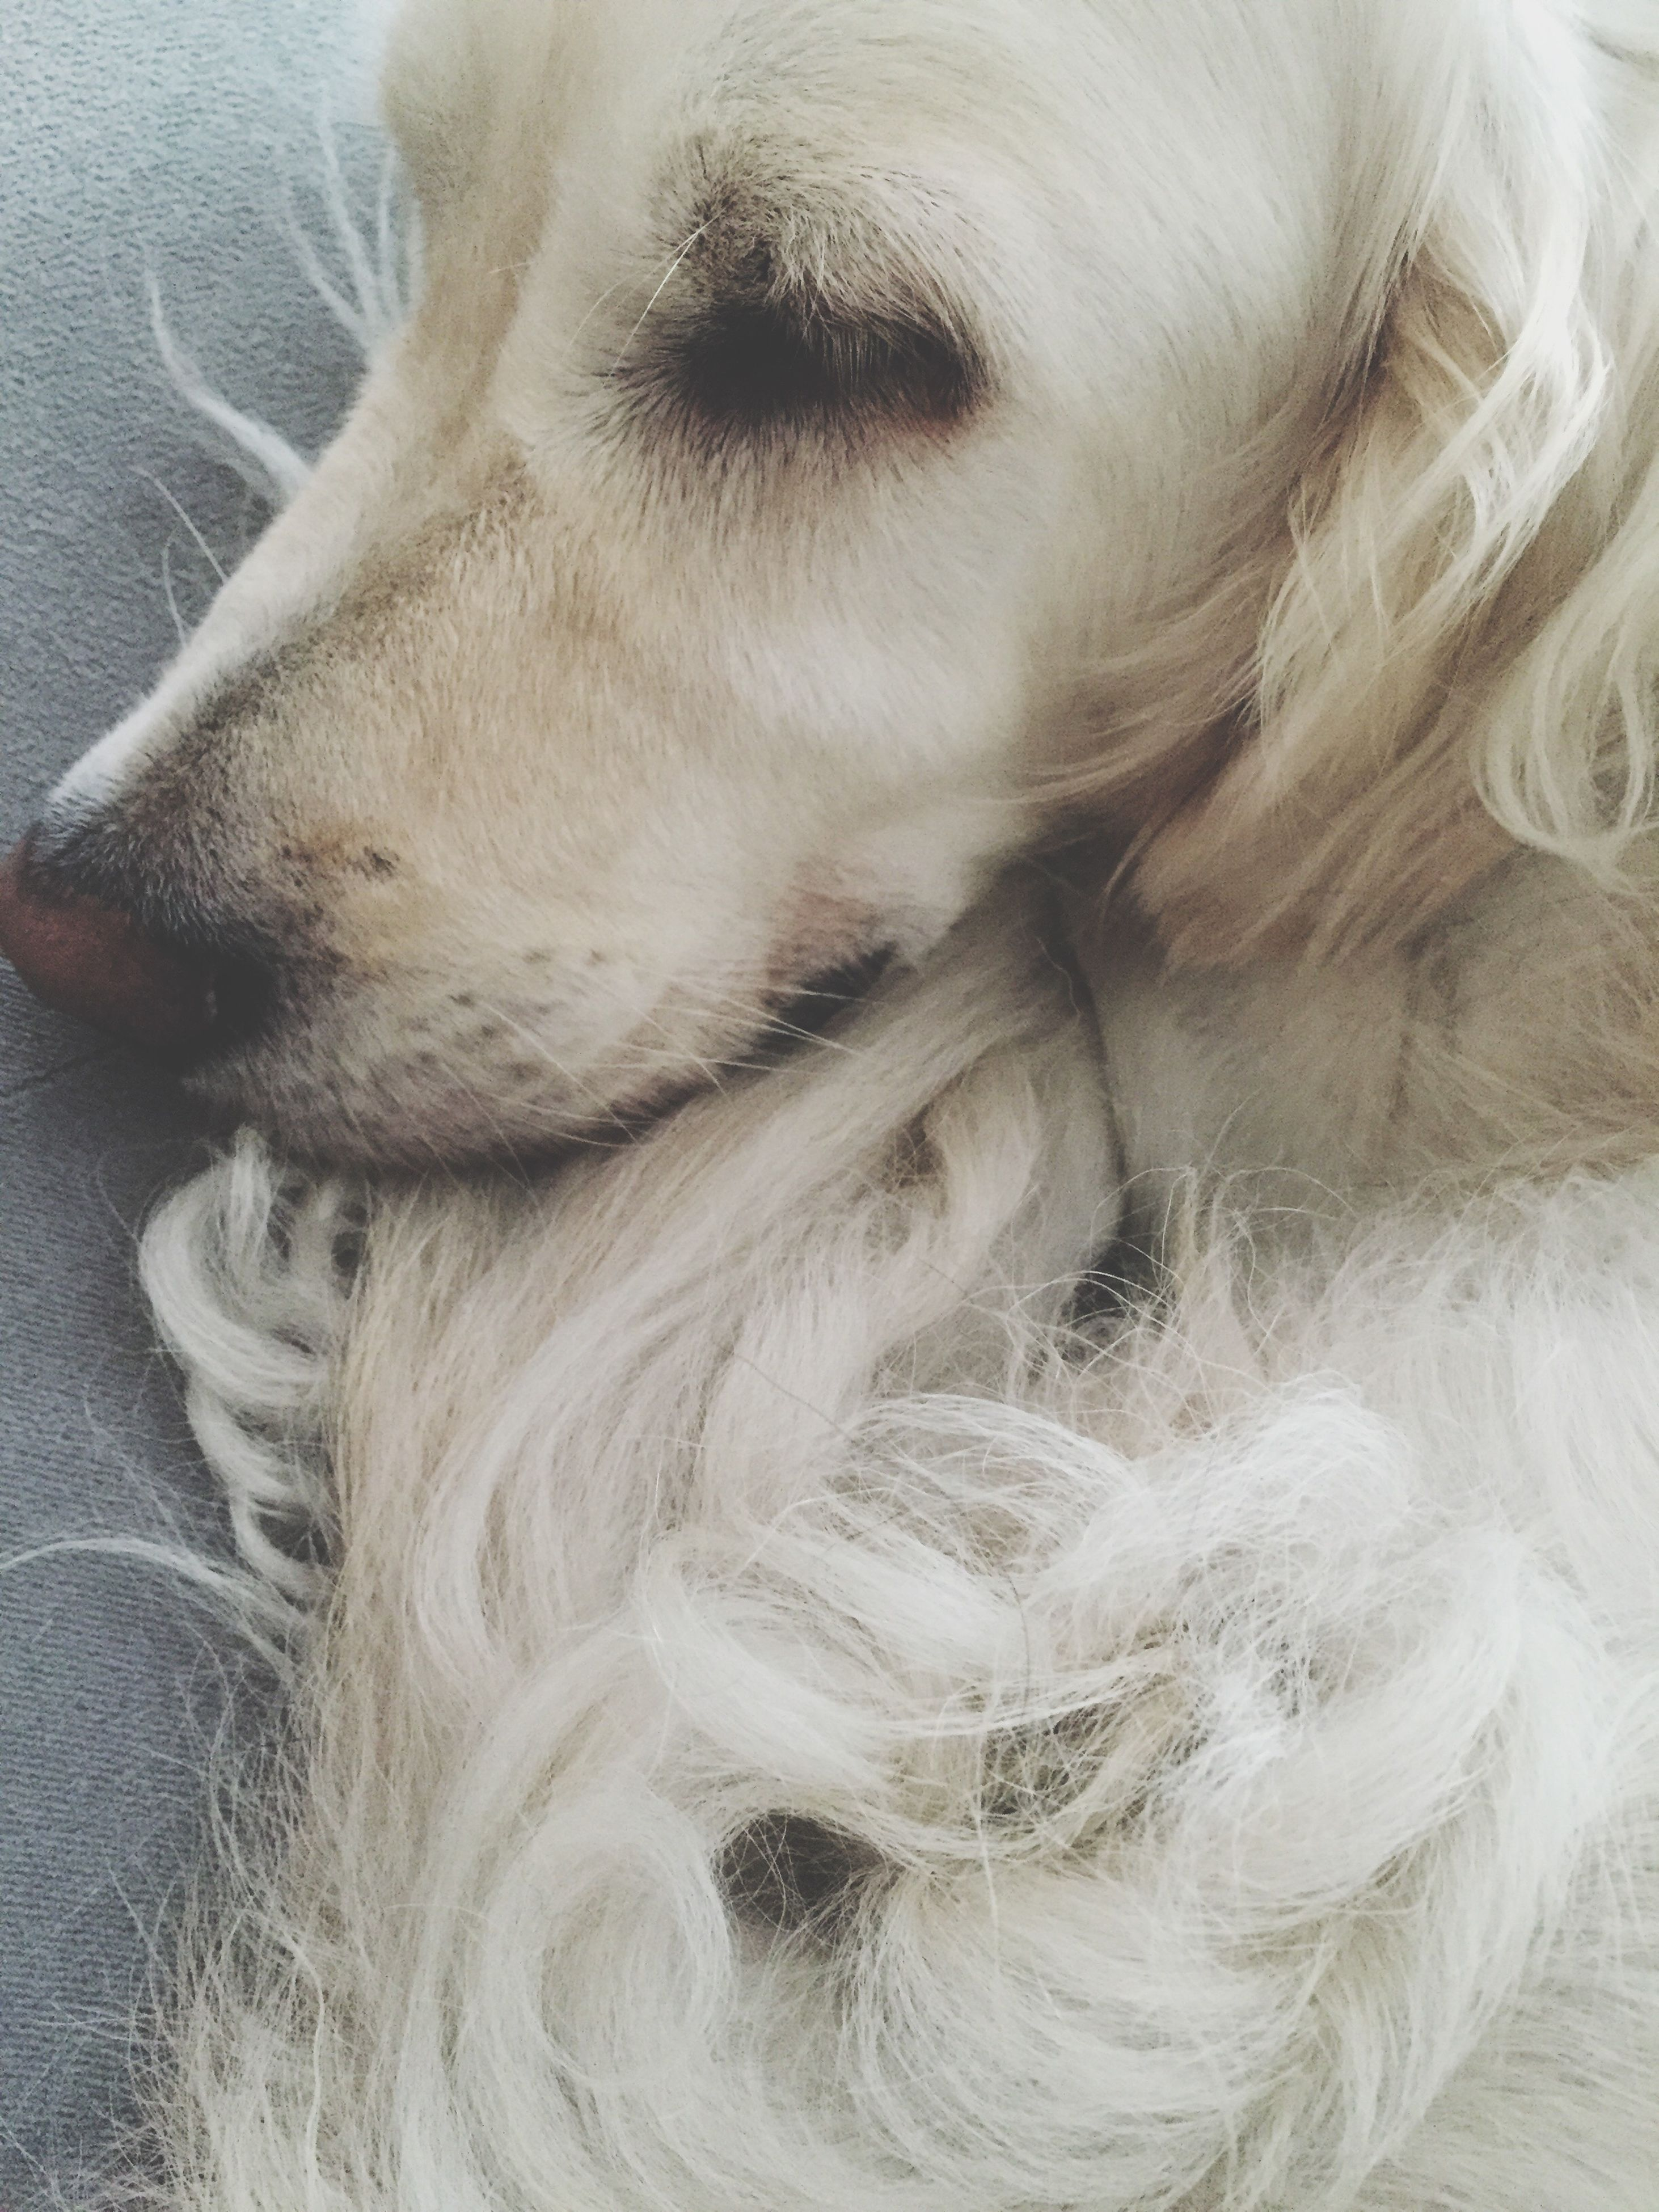 one animal, animal themes, dog, domestic animals, pets, close-up, animal head, animal hair, zoology, loyalty, animal, pampered pets, outdoors, no people, animal nose